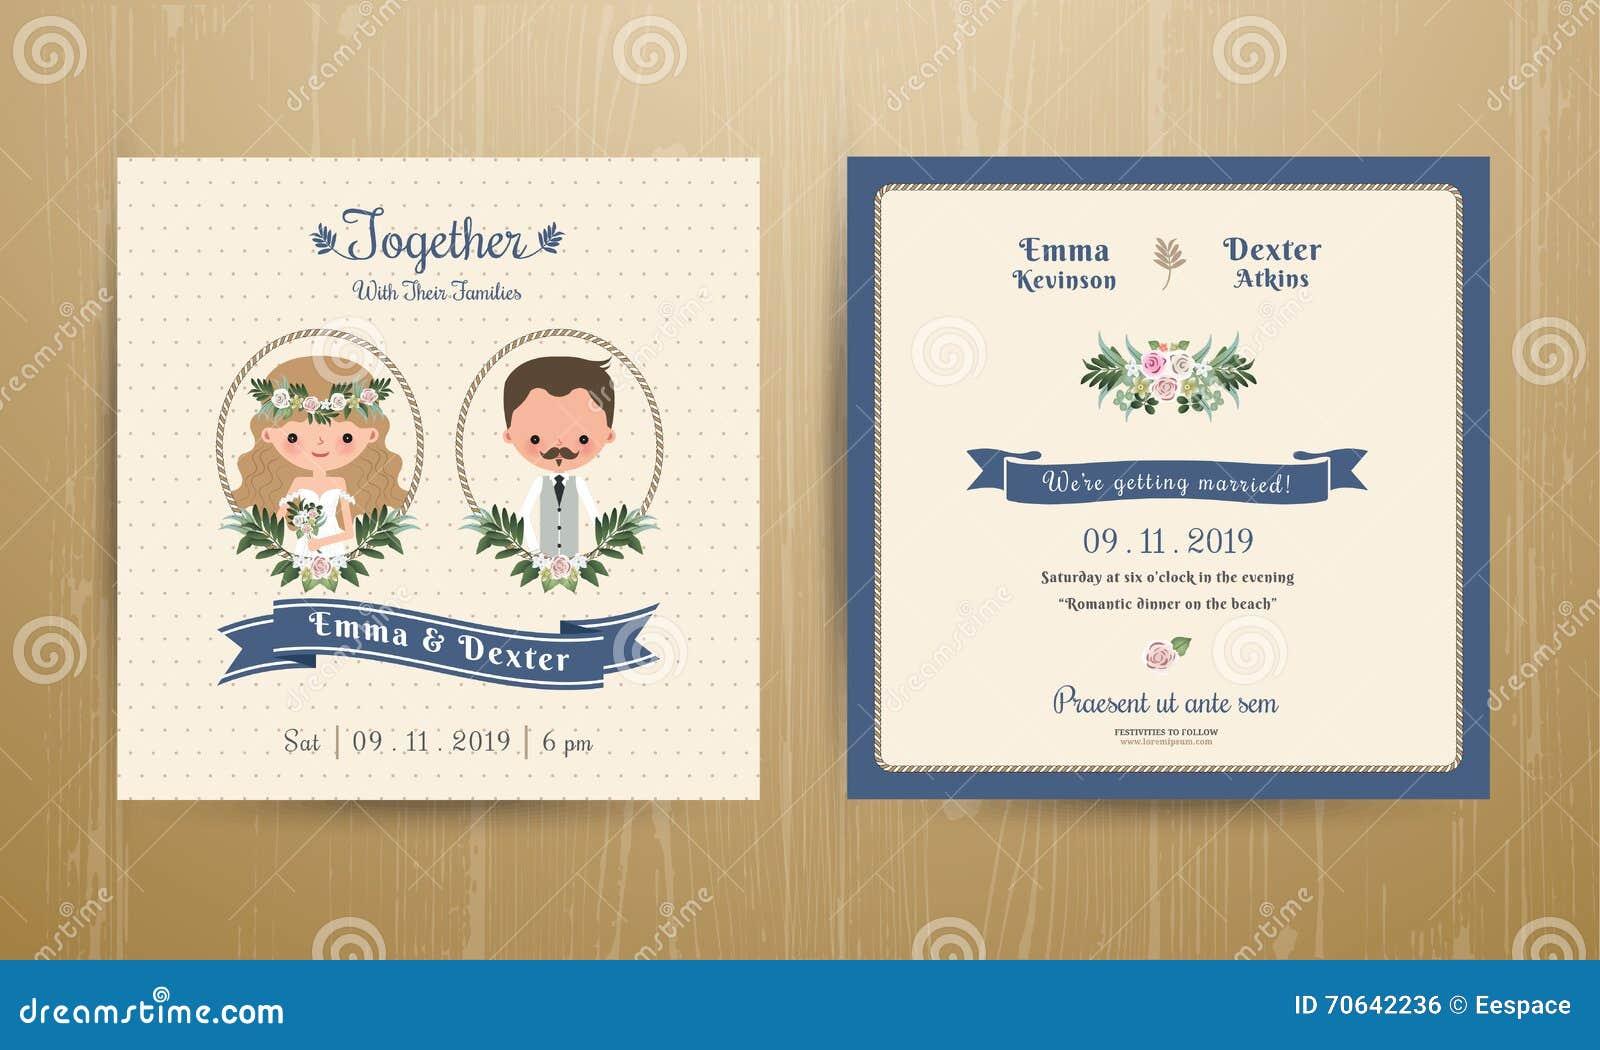 Wedding Invitation Card Rustic Cartoon Bride And Groom Stock Vector ...